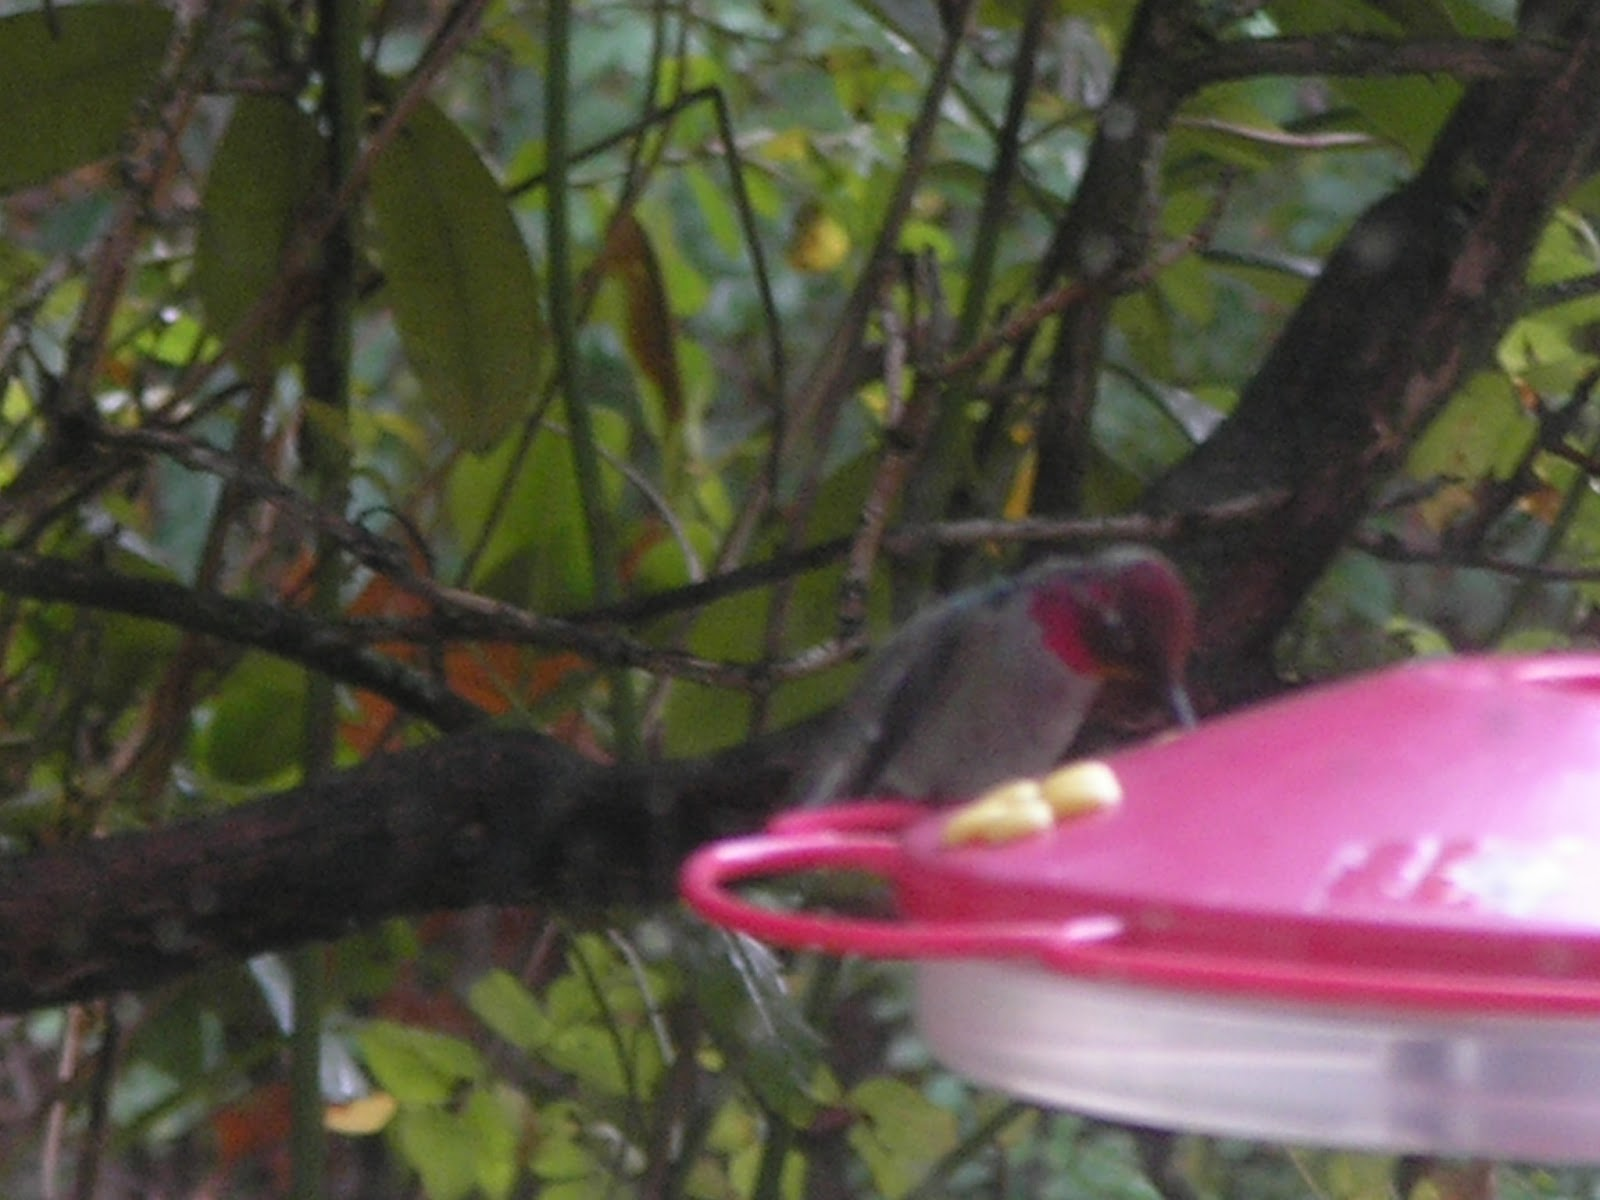 http://3.bp.blogspot.com/-fq1hYlVzG7E/VjxOceltubI/AAAAAAAABpM/V5MorYjjt4g/s1600/Annas_Hummingbird_Male_2015-11-02_PB021774.JPG